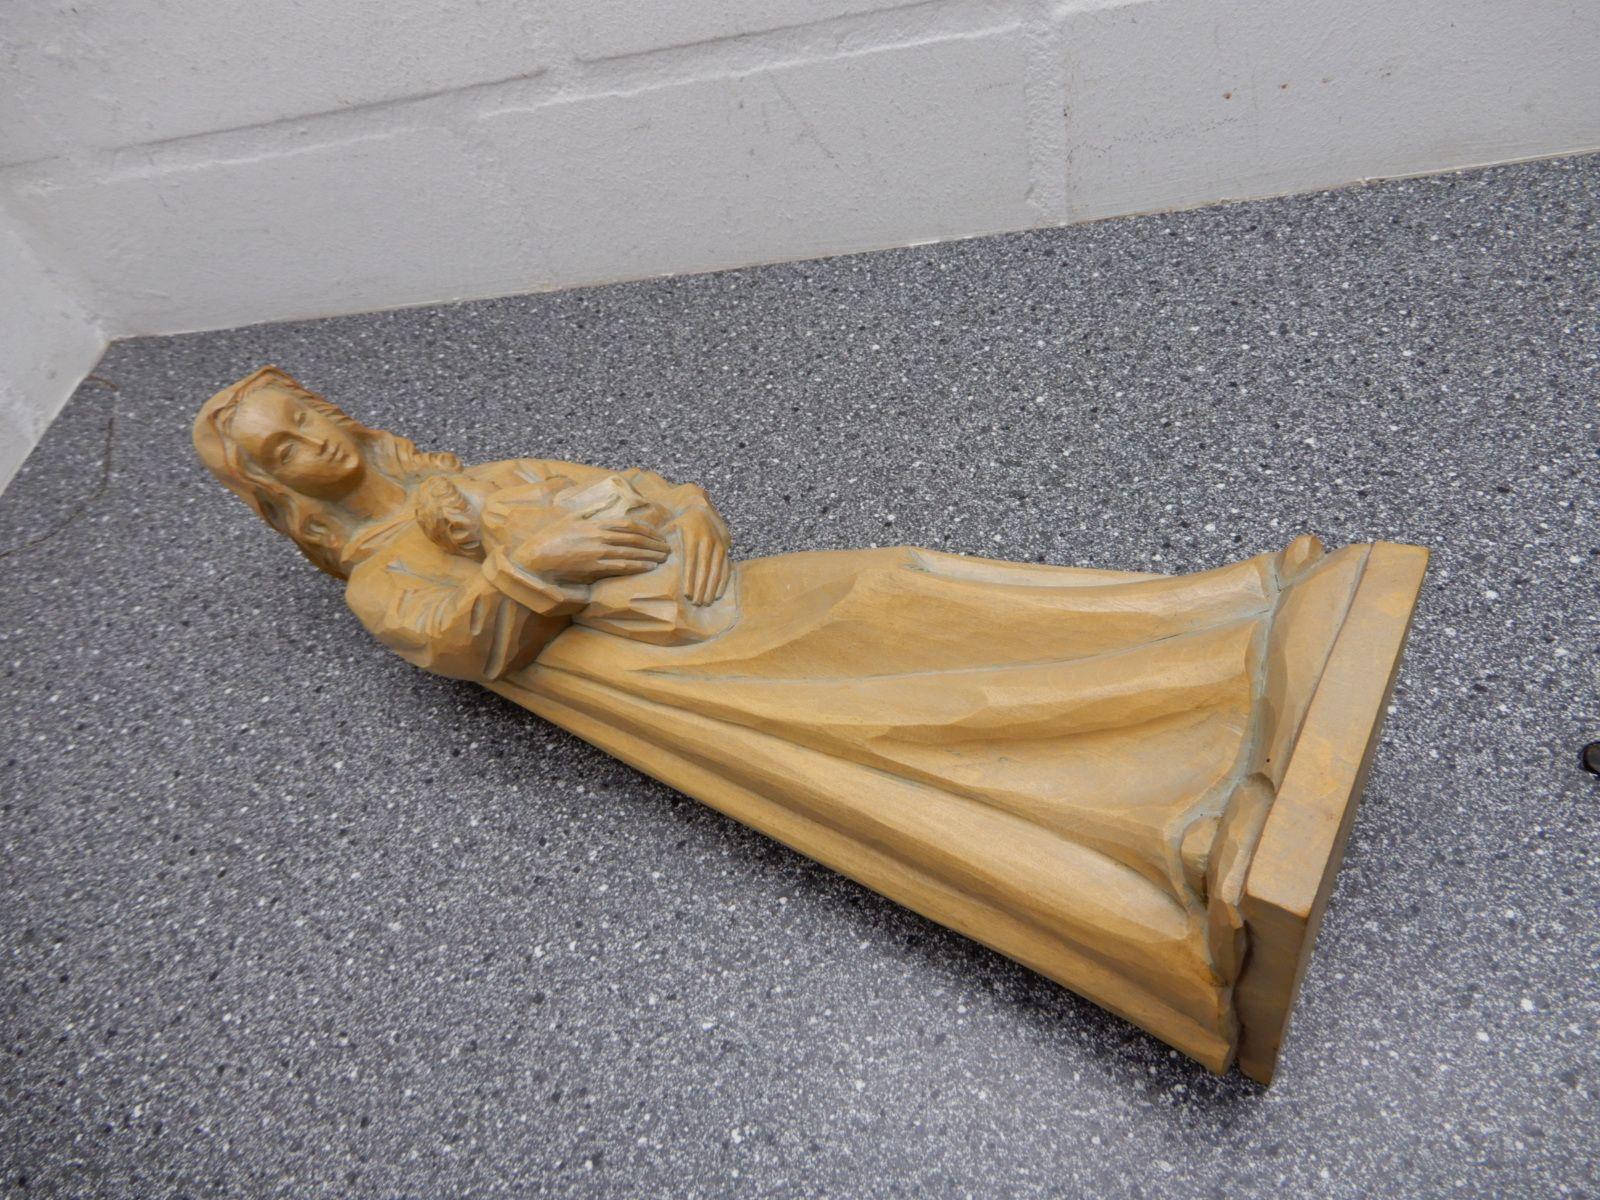 maria mit kind holzfigur figur aus holz handgeschnitzt h he 40 cm ebay. Black Bedroom Furniture Sets. Home Design Ideas